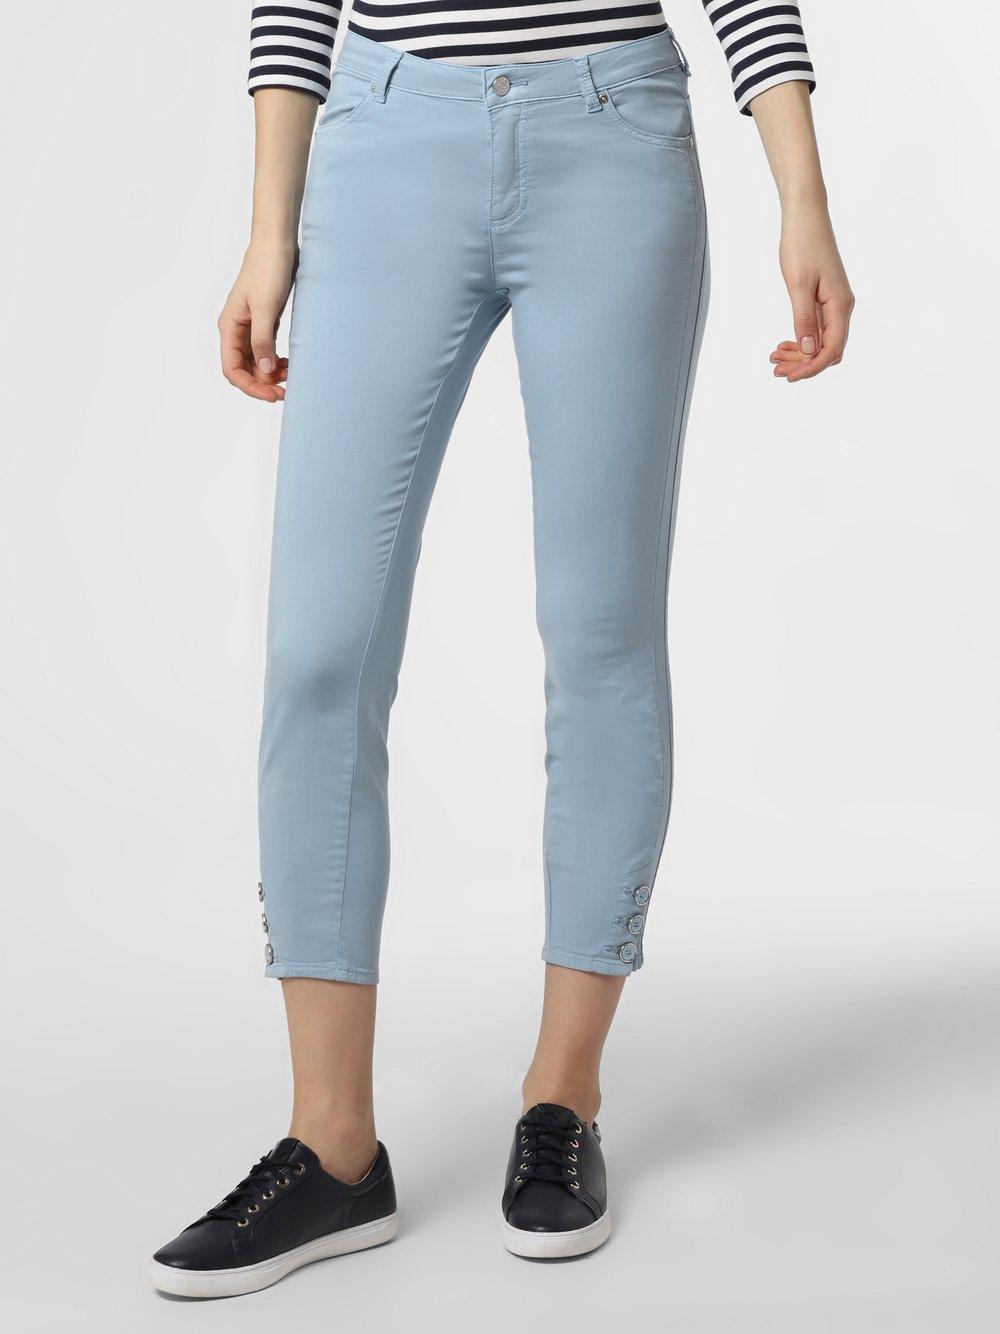 Rosner - Spodnie damskie – Antonia, niebieski